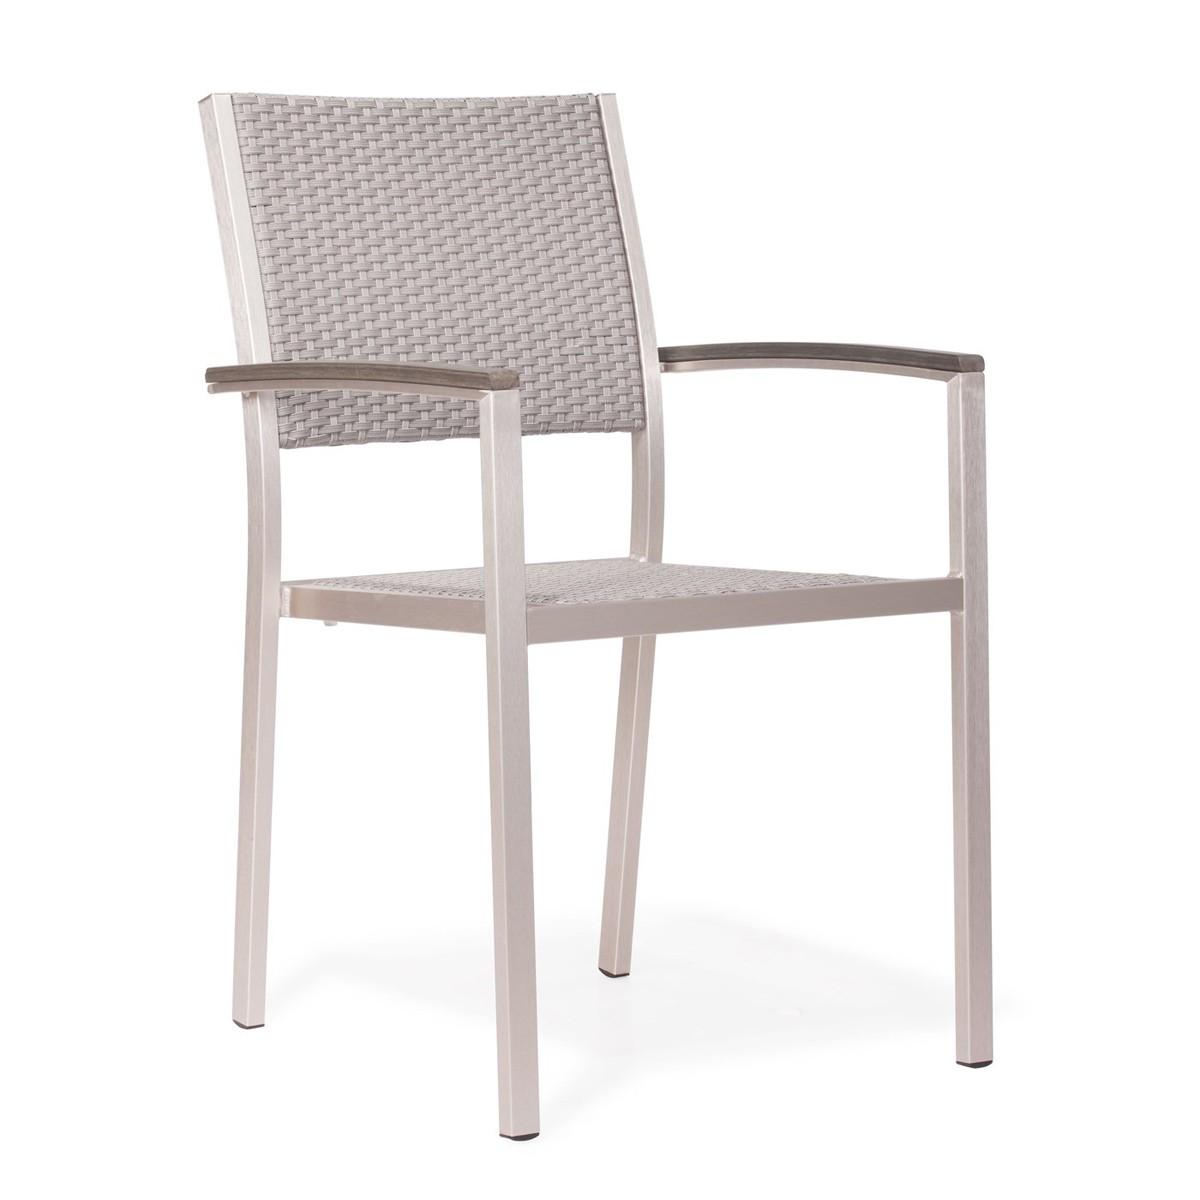 Zuo Modern Metropolitan Dining Arm Chair - Brushed Aluminum